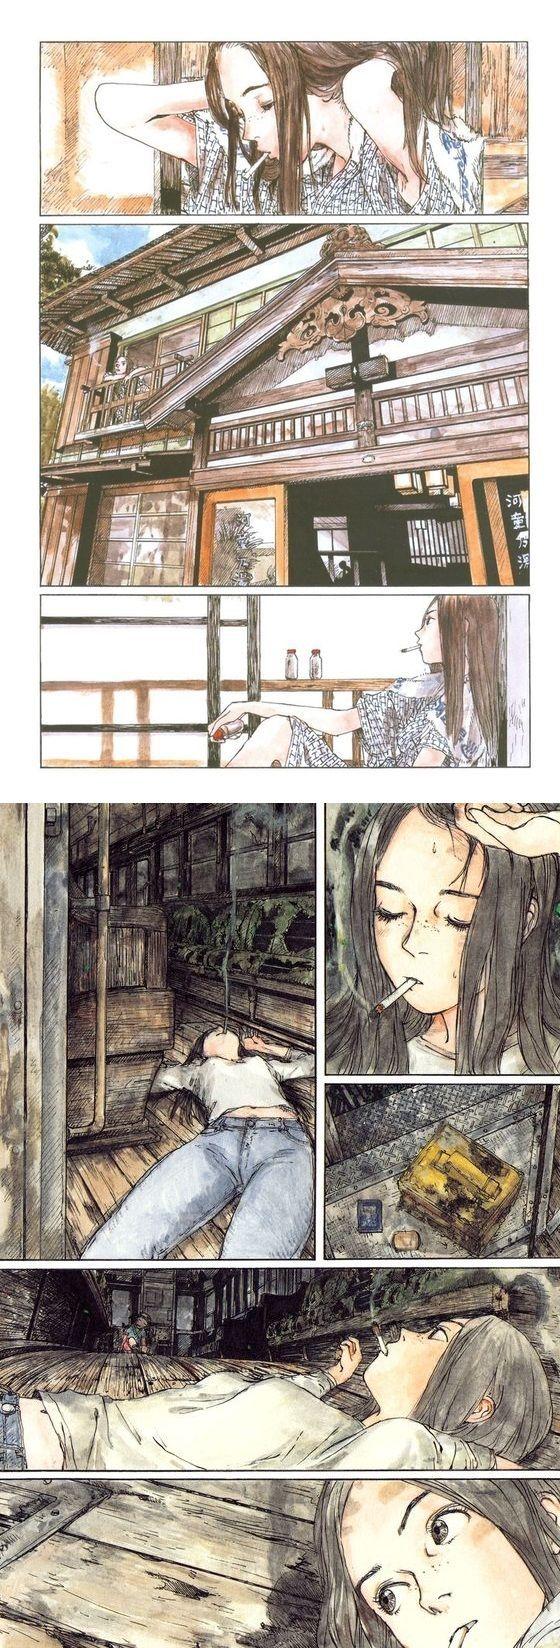 Wandering Emanon by Kenji Tsuruta